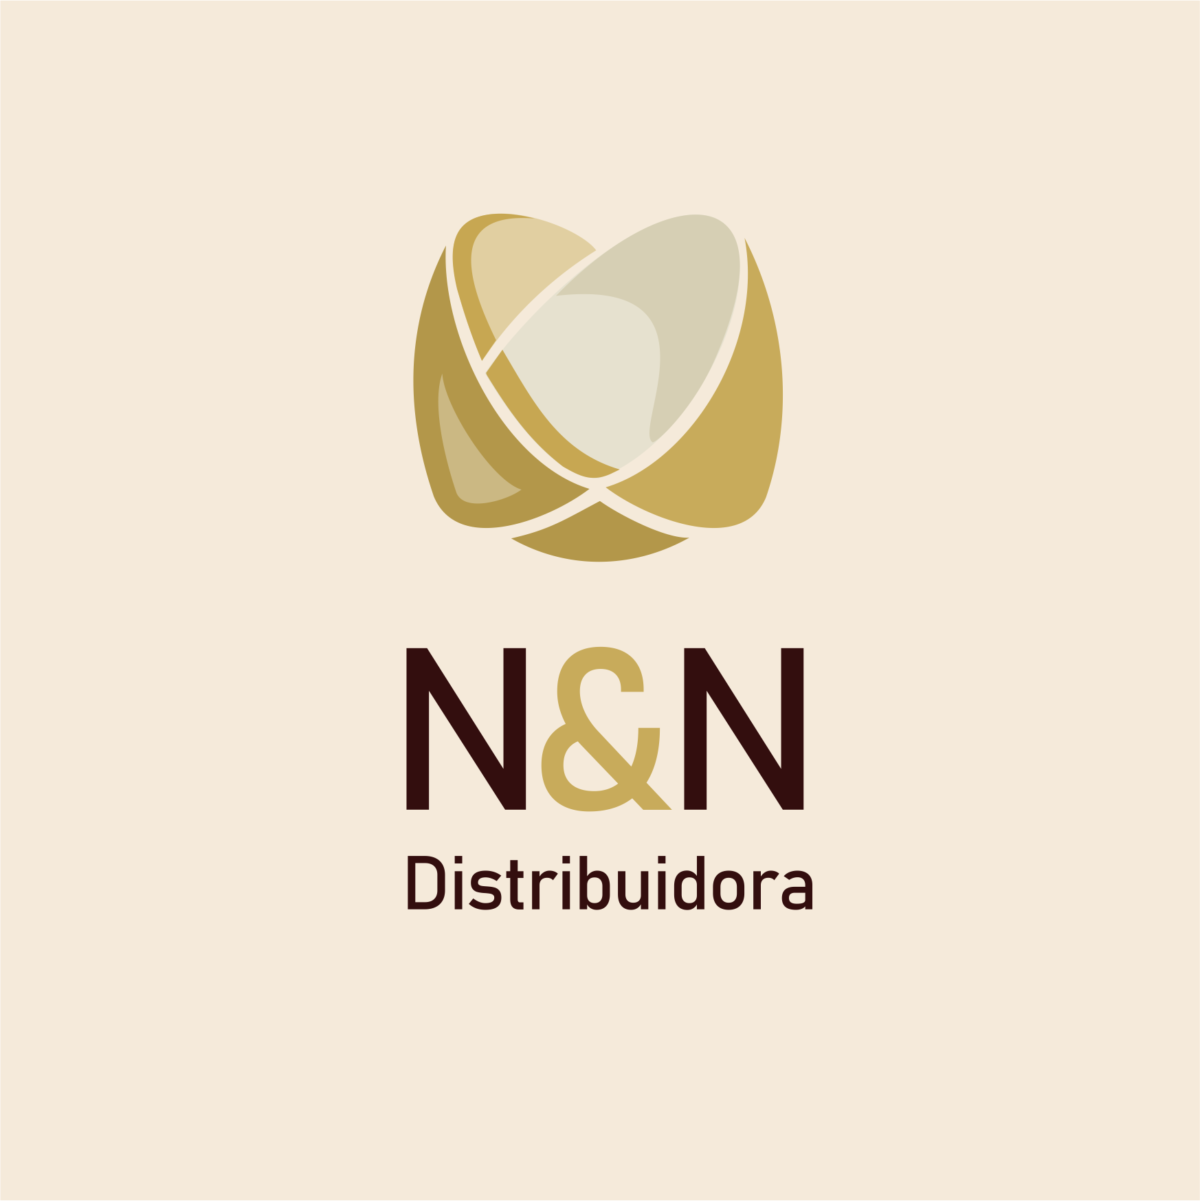 N&N Distribuidora